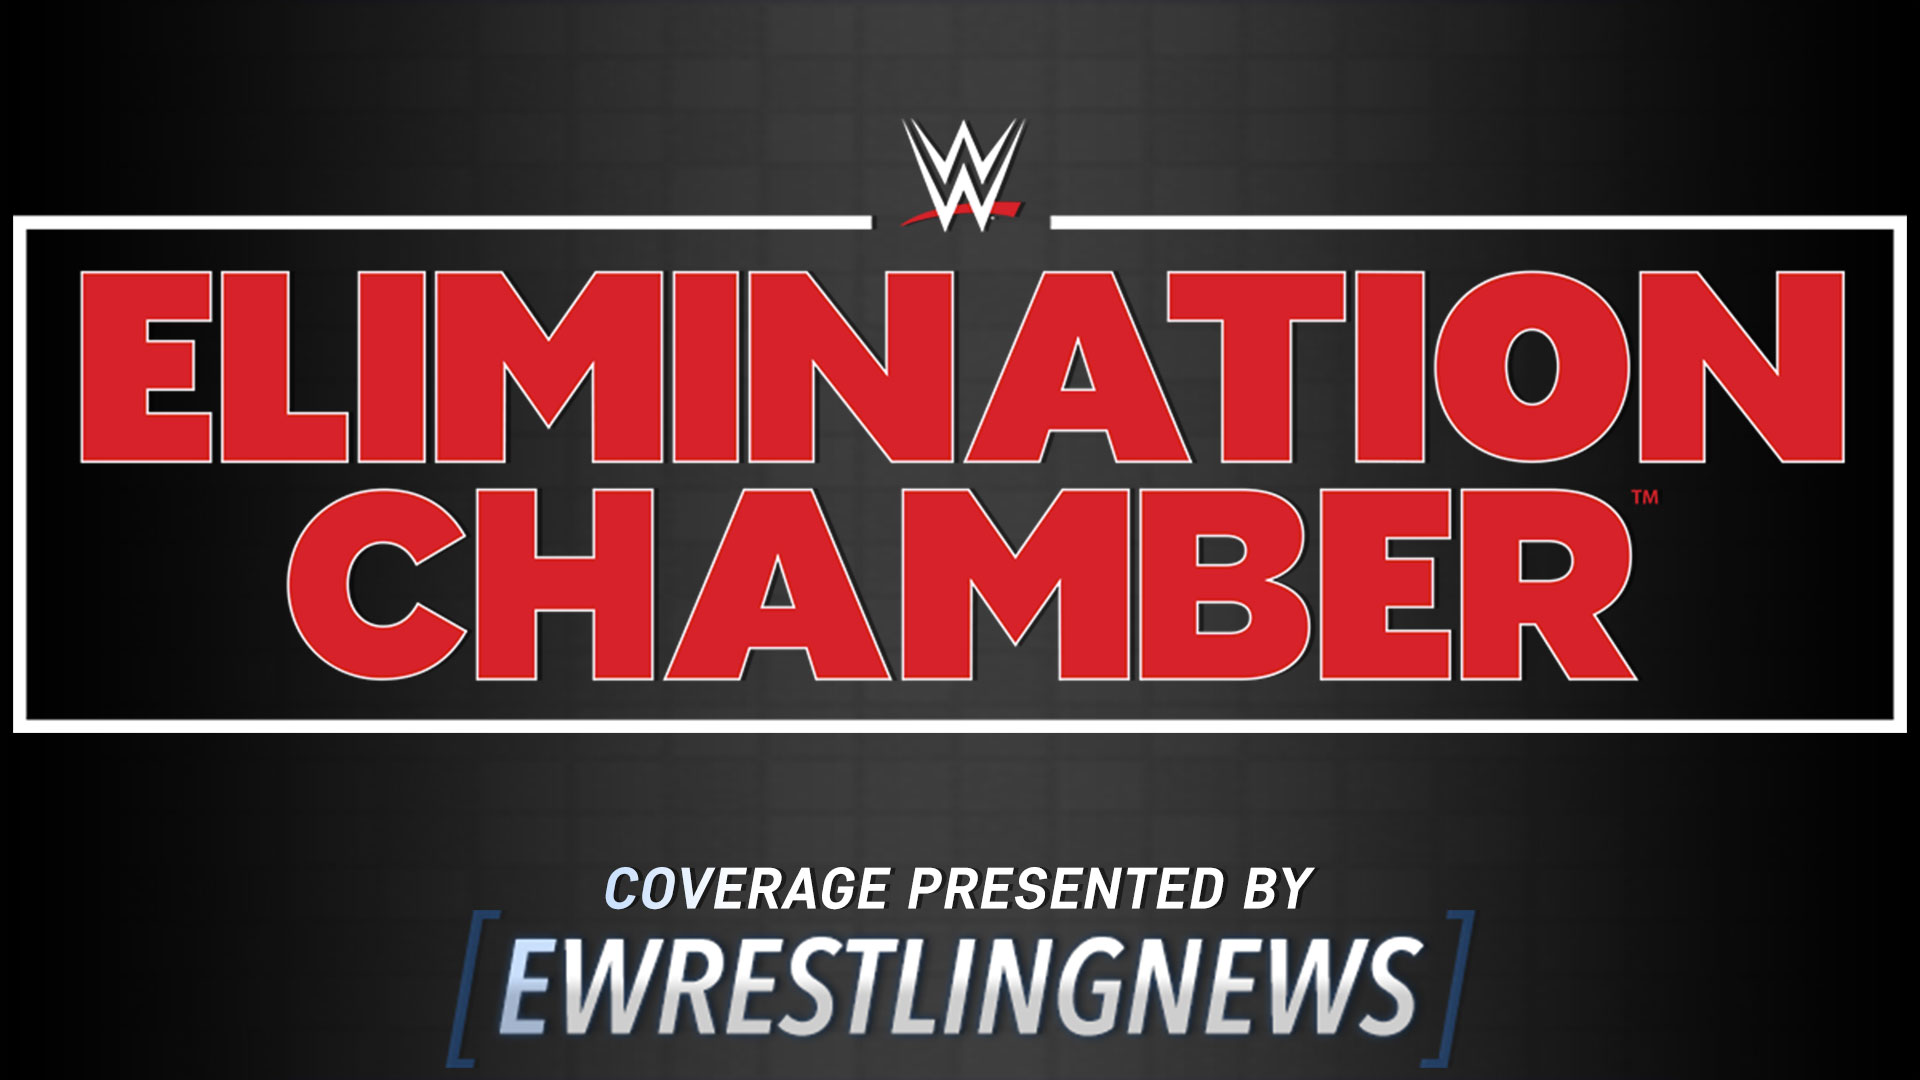 WWE Elimination Chamber Results March 8 2020 eWrestlingNewscom 1920x1080